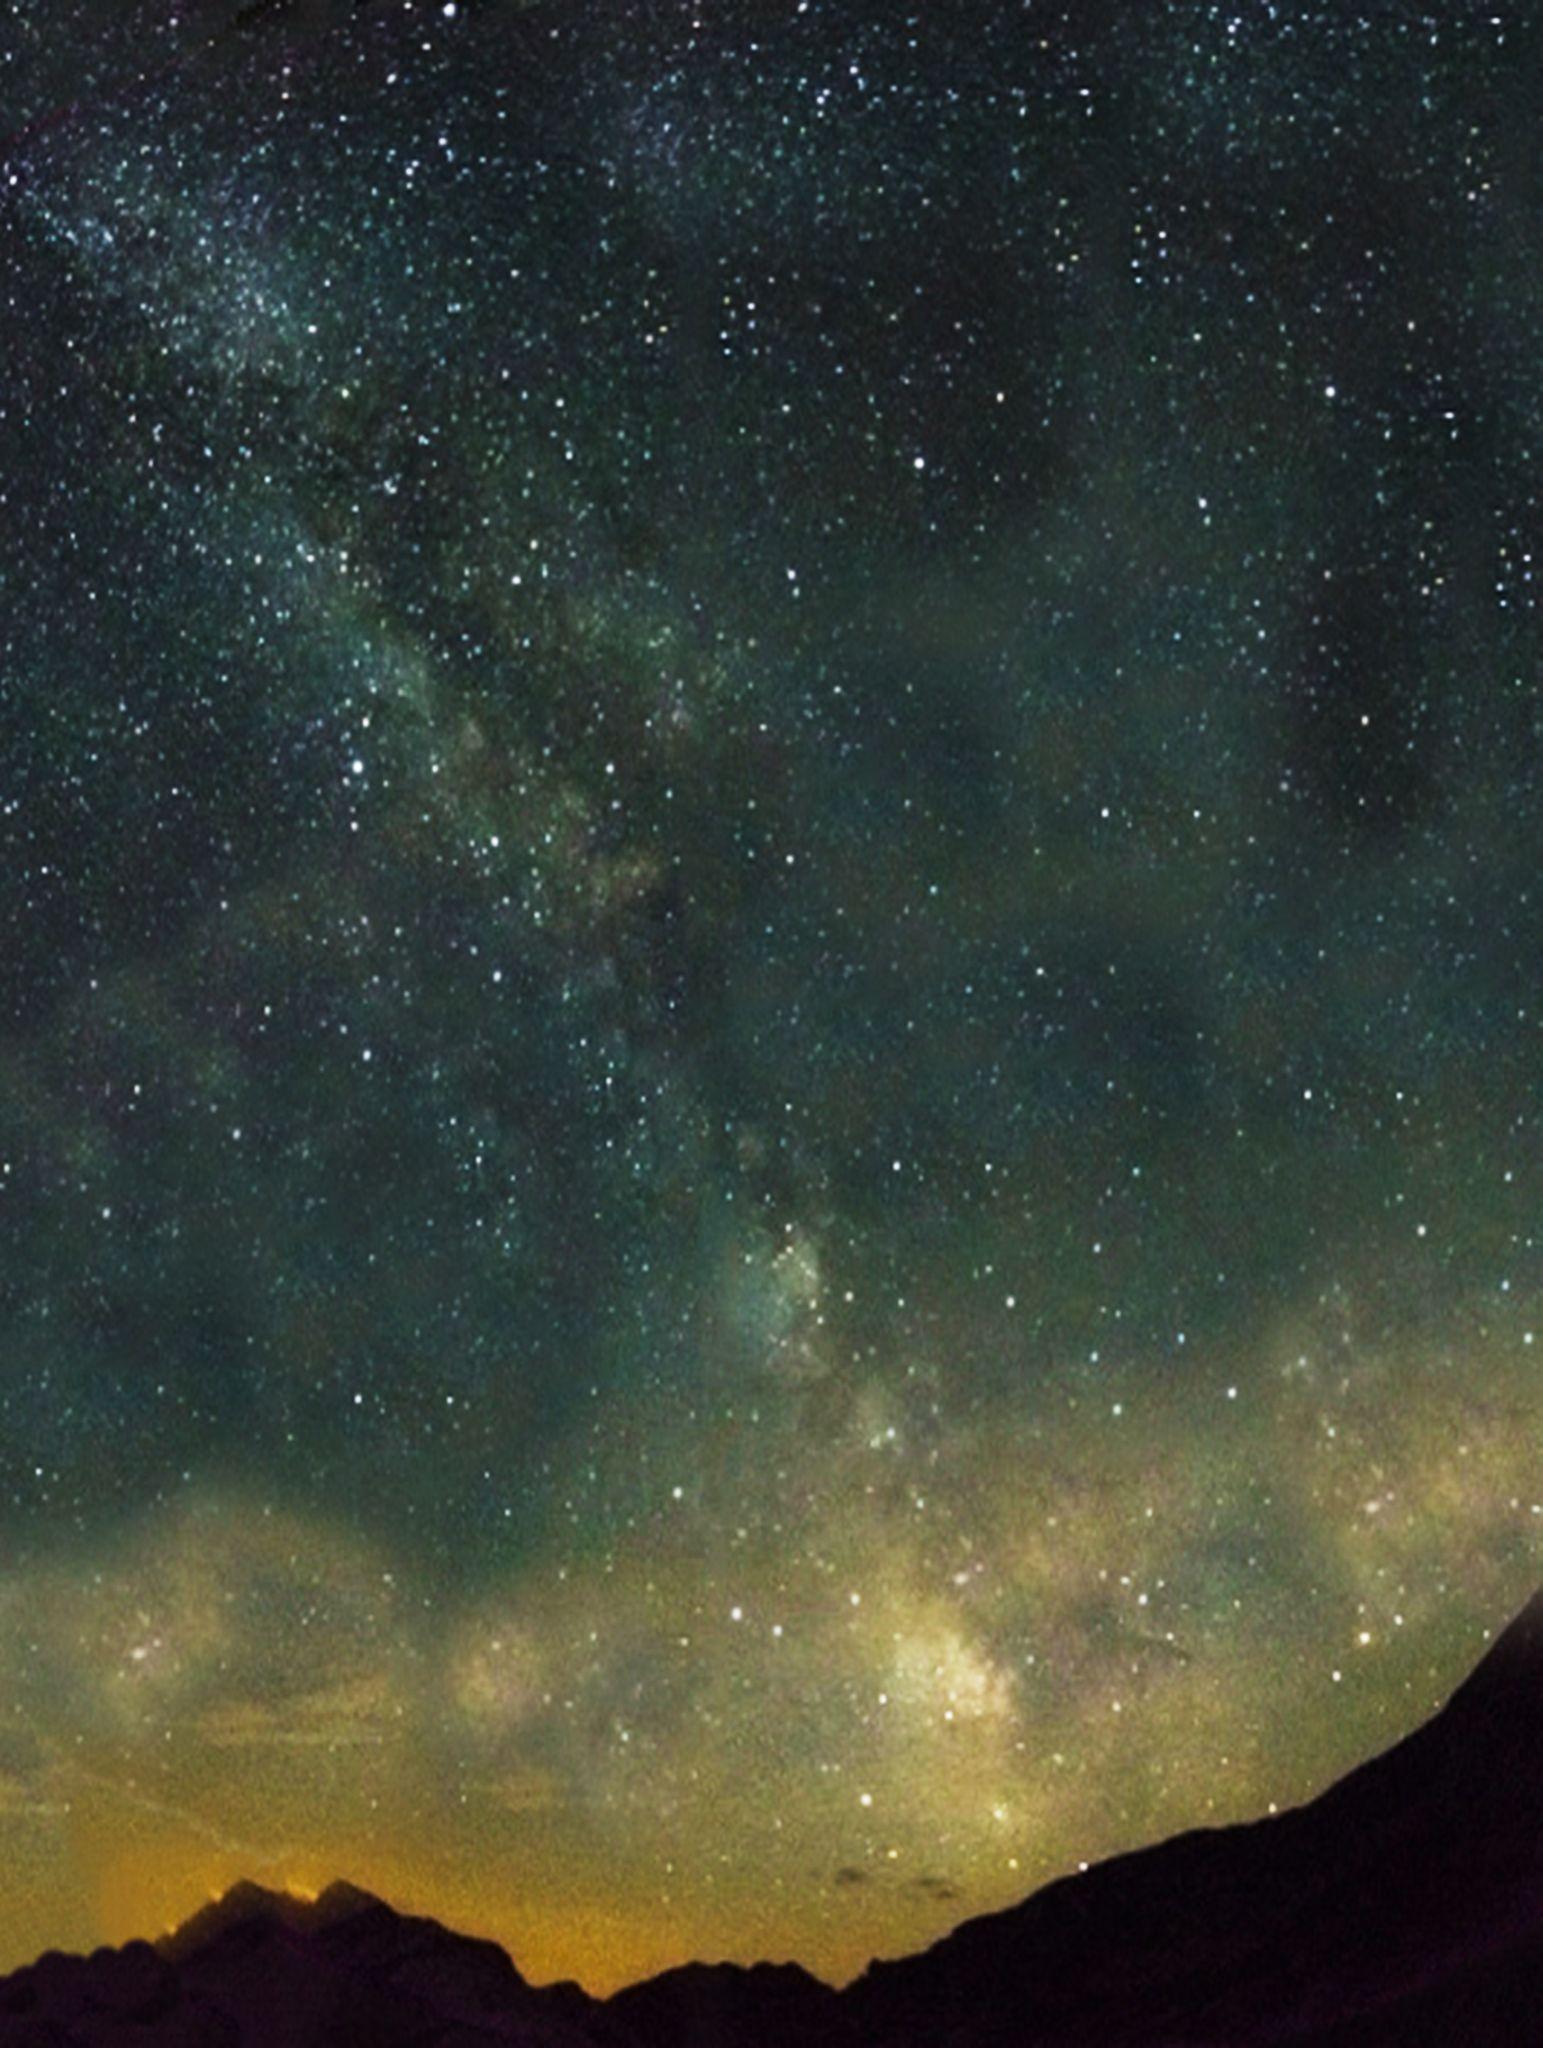 Milky way in Retezat mountain by Szanto Alexandru